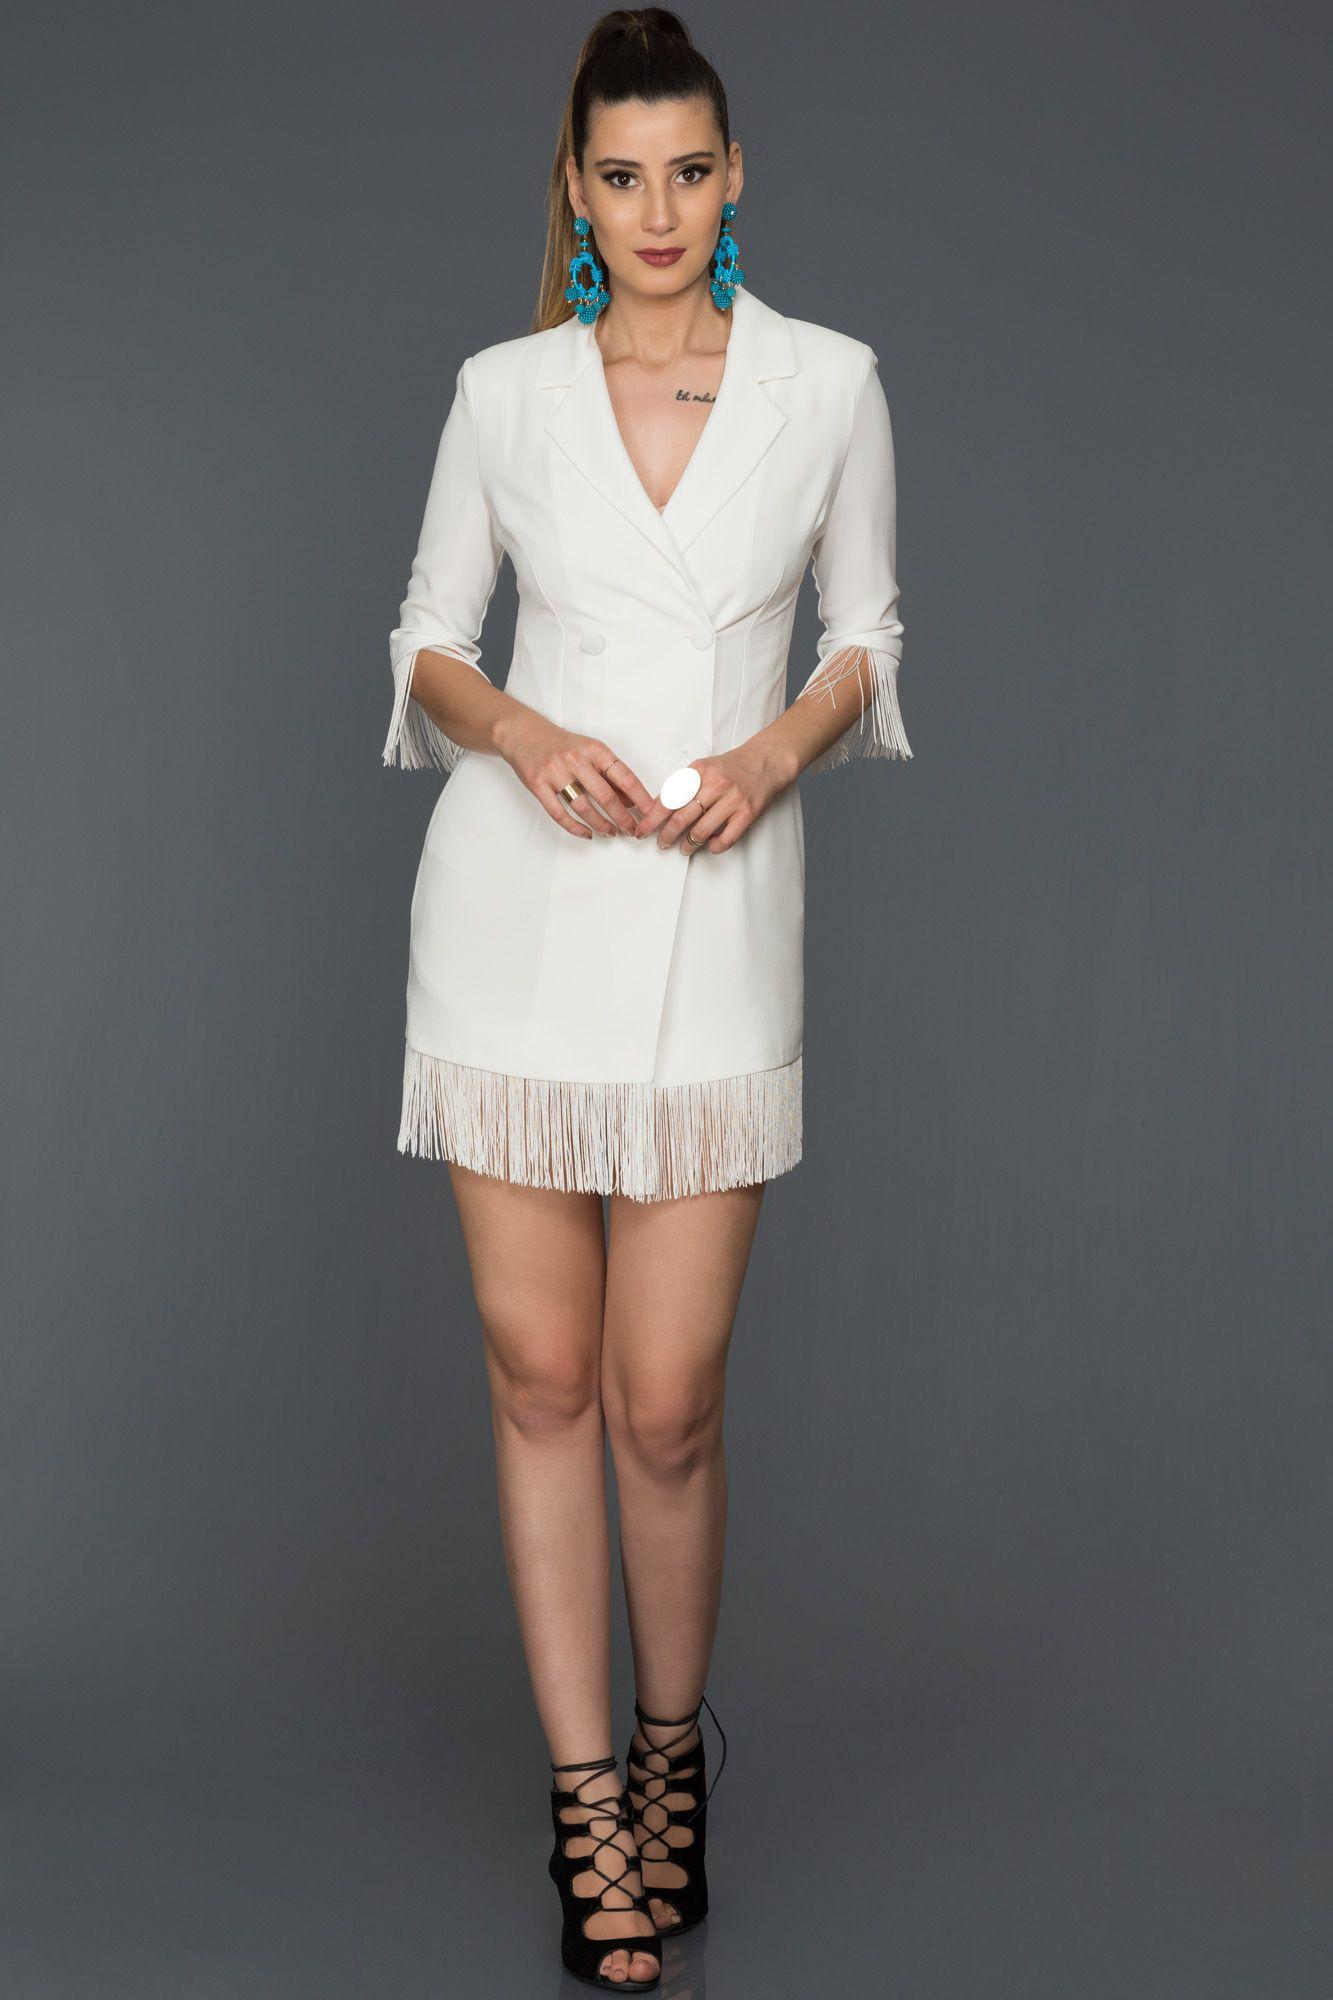 Ekru Puskullu V Yaka Ceket Elbise Abk064 Elbise Elbiseler Elbise Modelleri